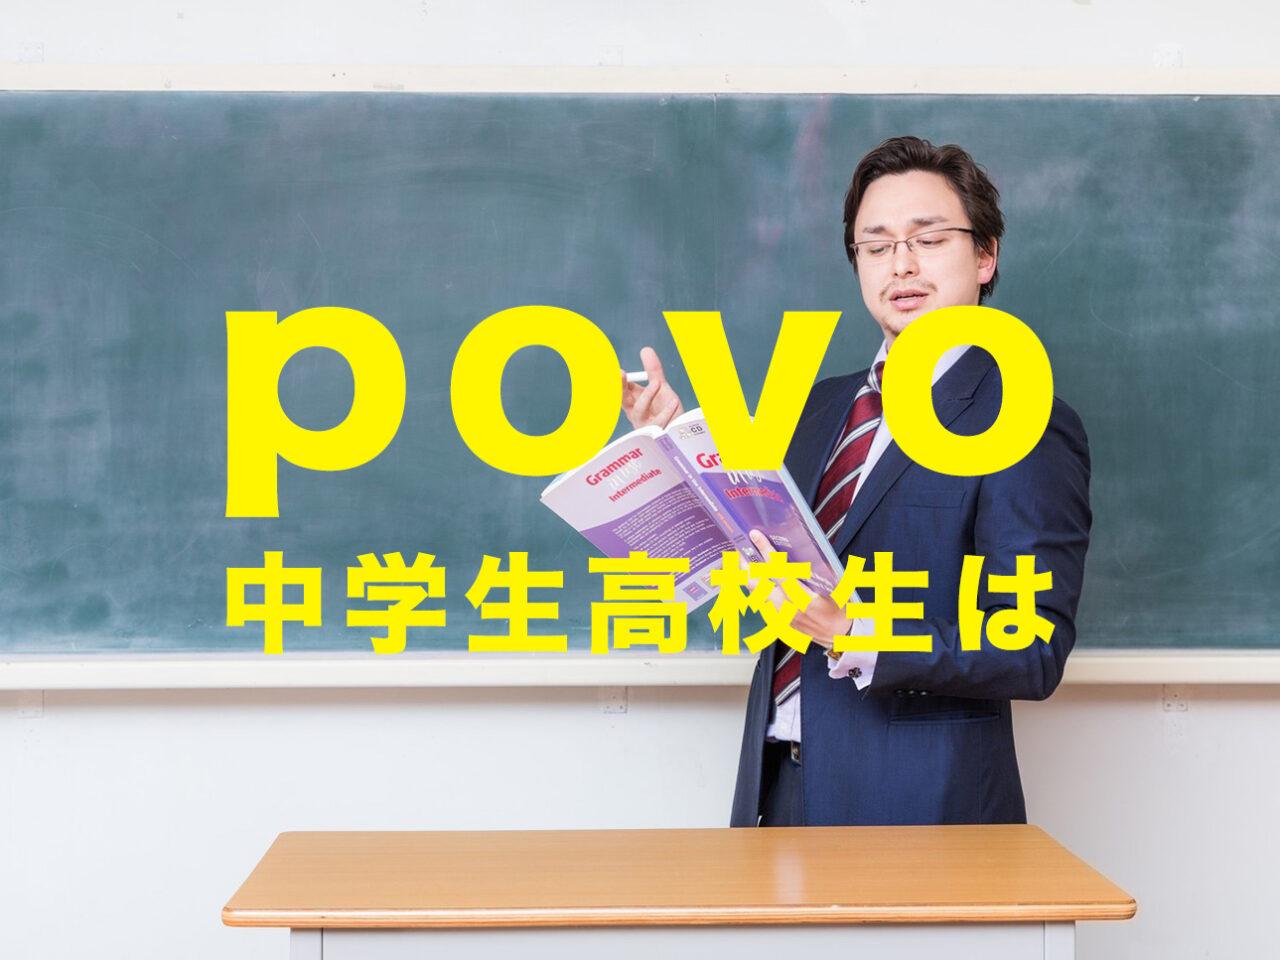 povo(ポヴォ)は高校生や中学生&子供でも契約や利用ができる?できない?のサムネイル画像